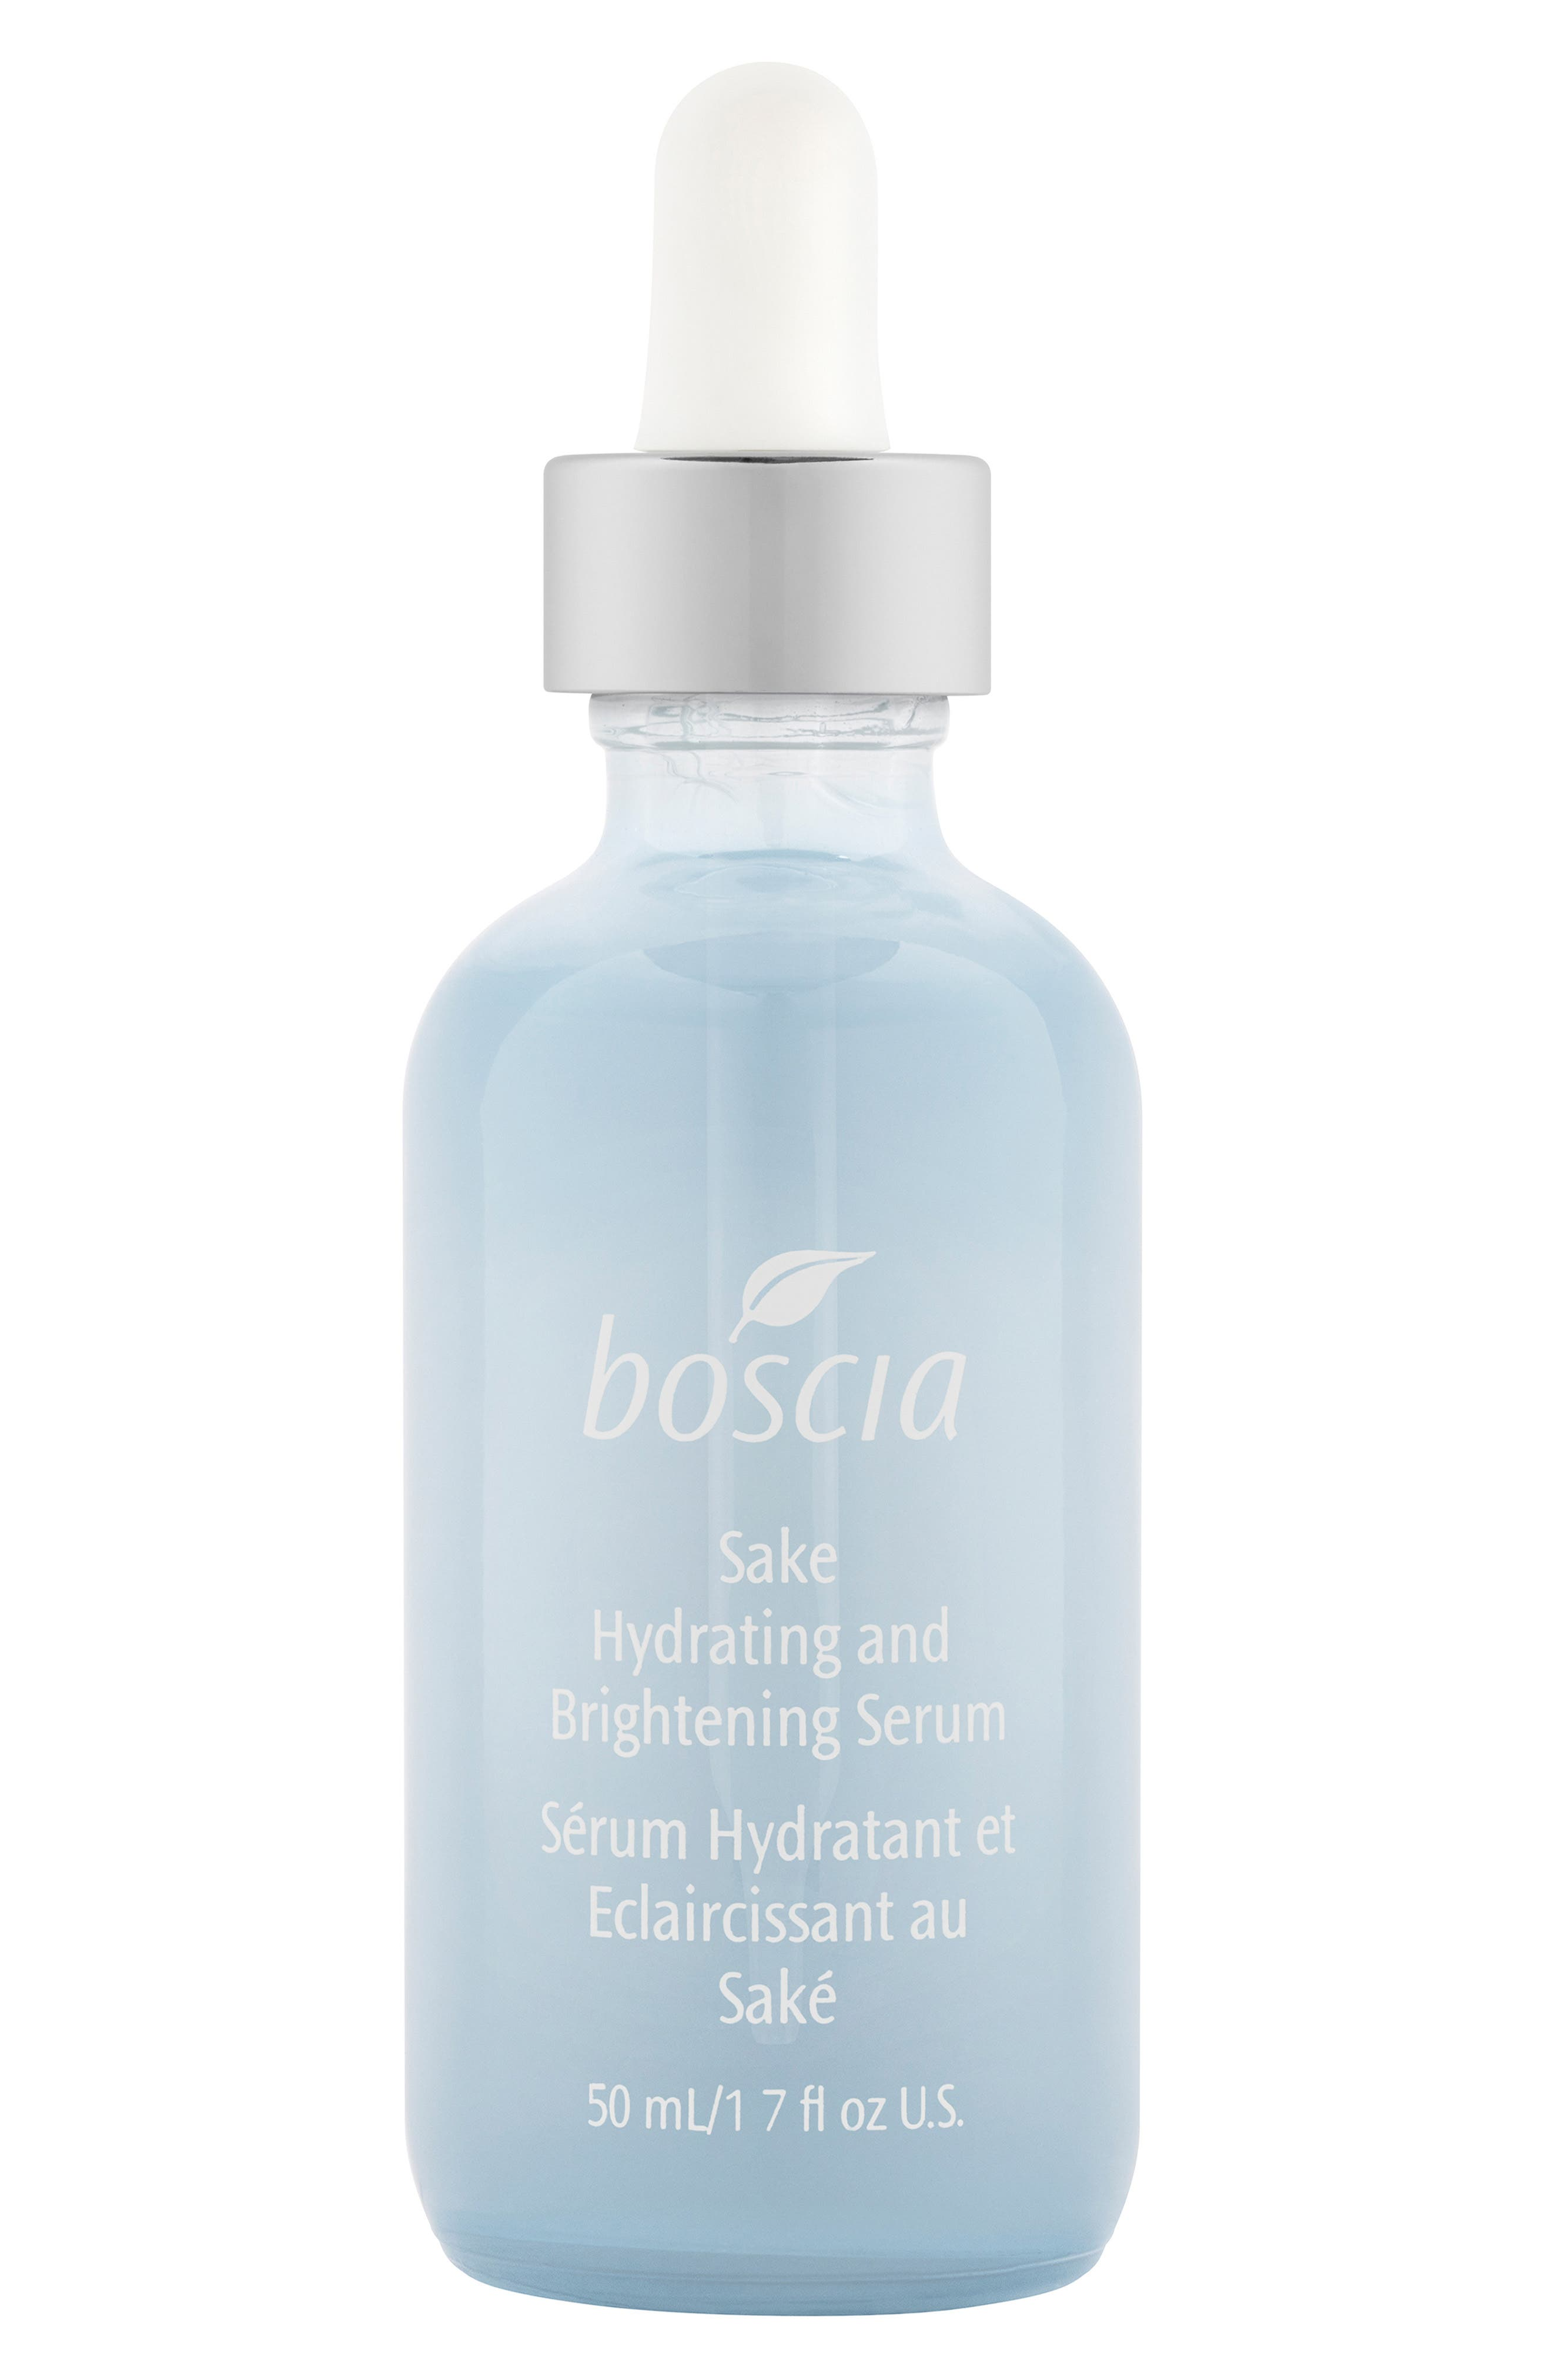 BOSCIA, Sake Hydrating and Brightening Serum, Main thumbnail 1, color, NO COLOR